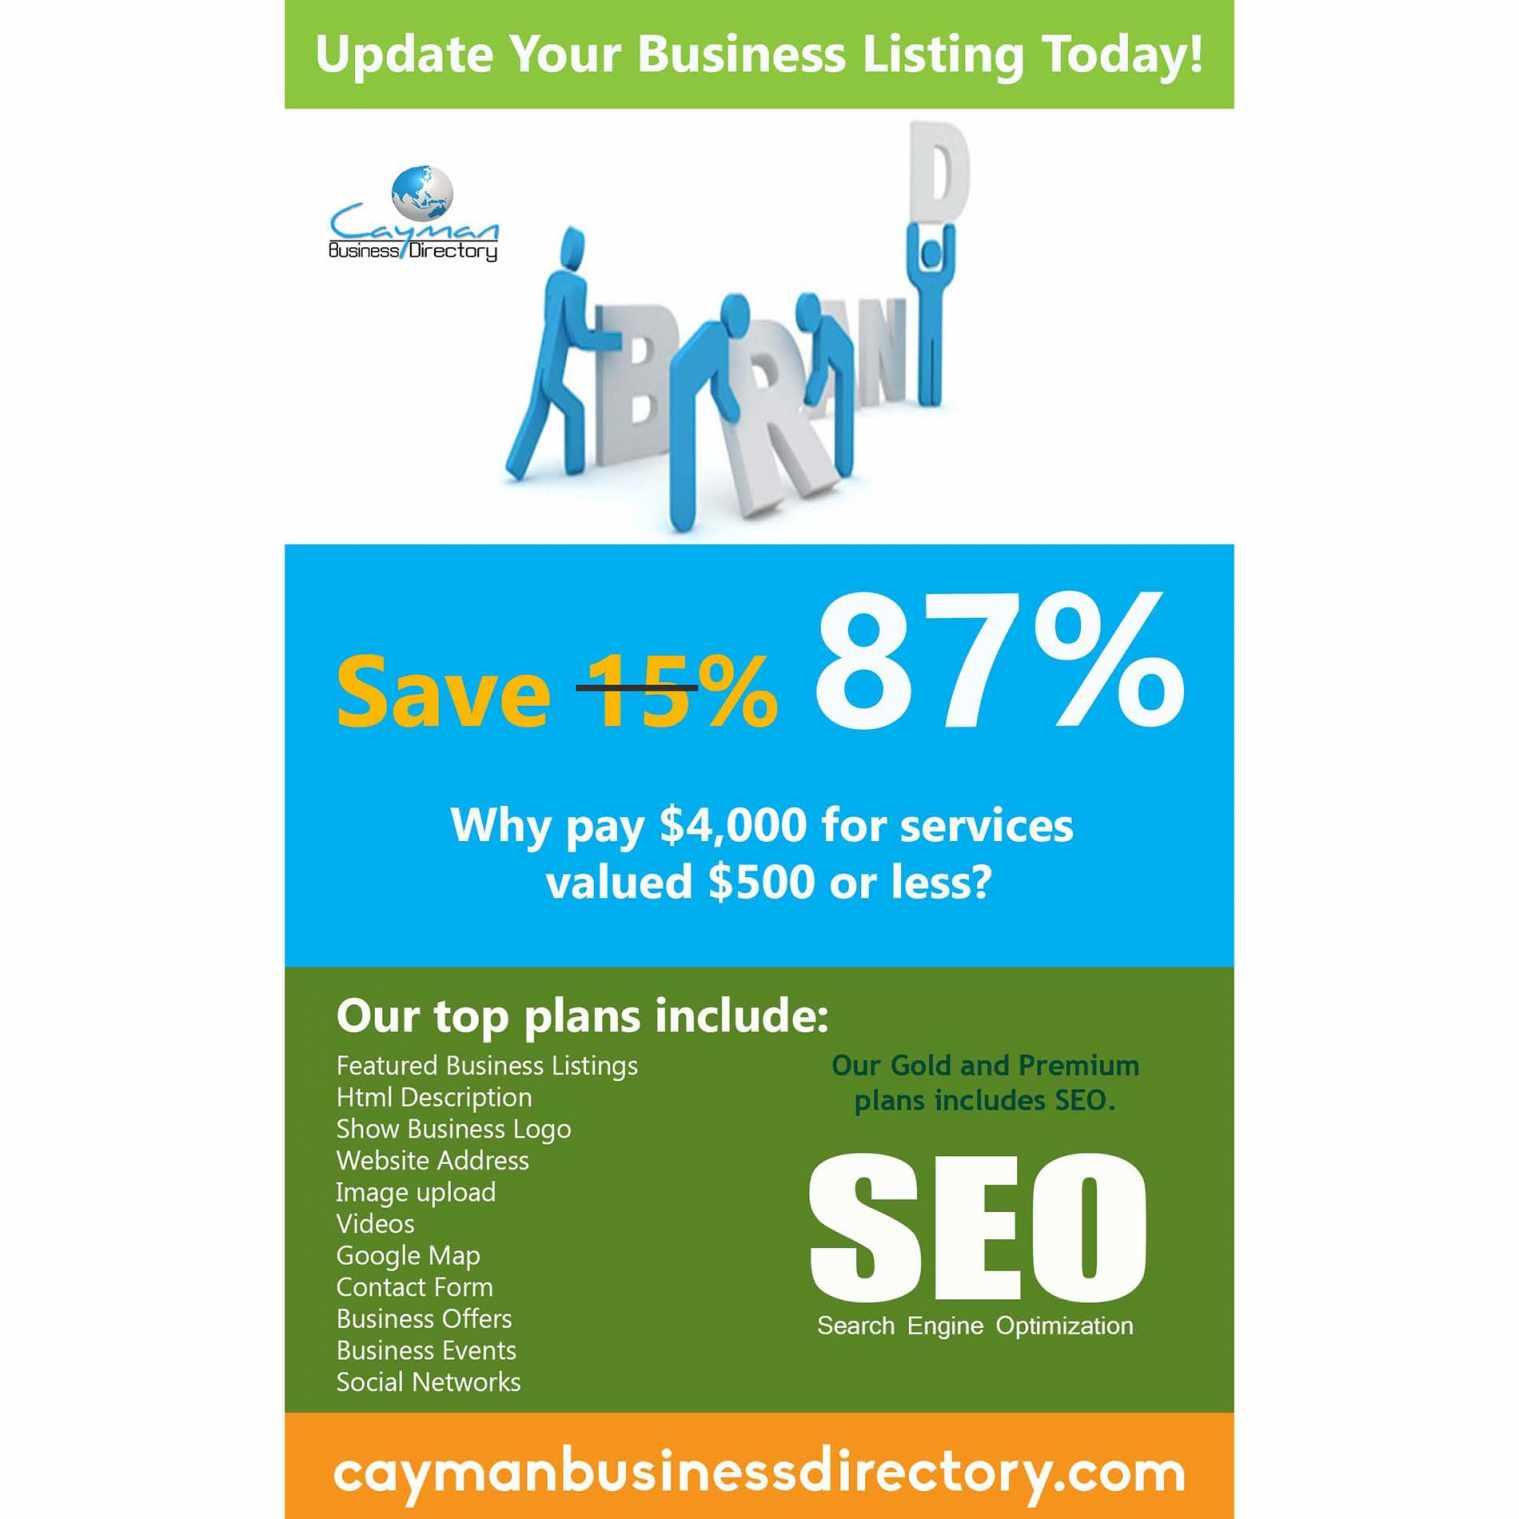 Cayman Bsuiness Directory savings 2